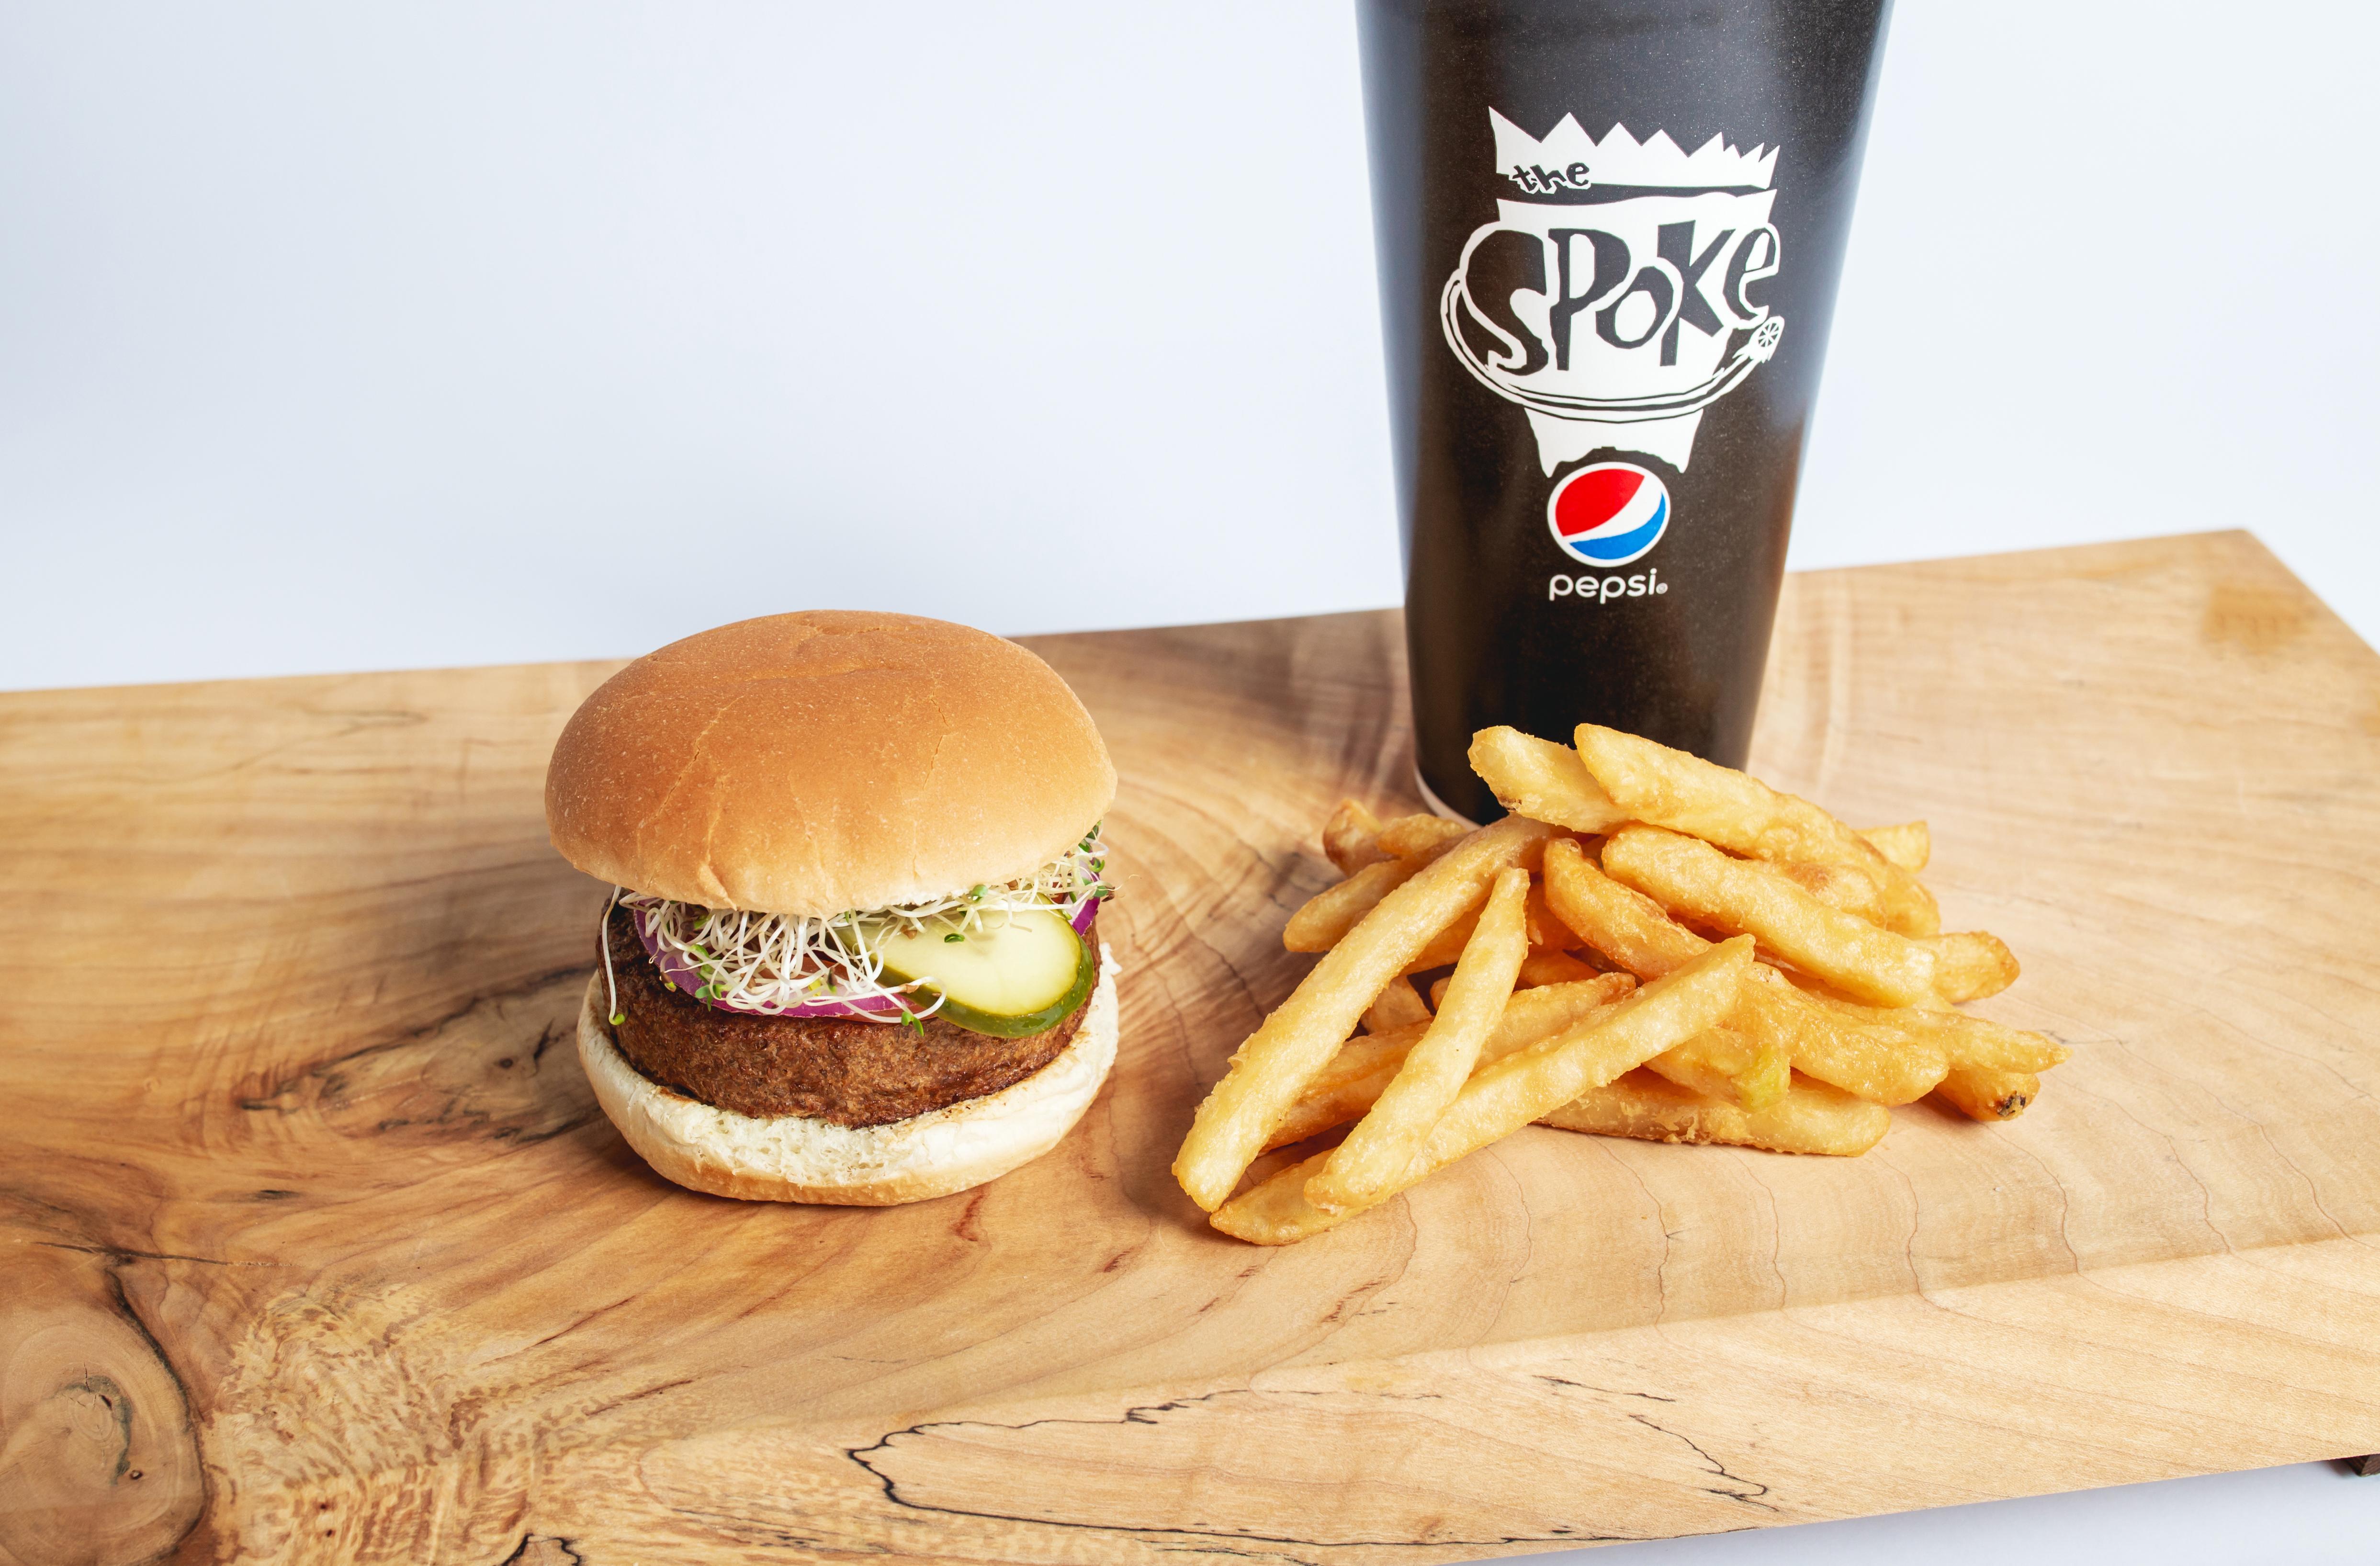 20190201 - Beyond Meat Burger.jpg